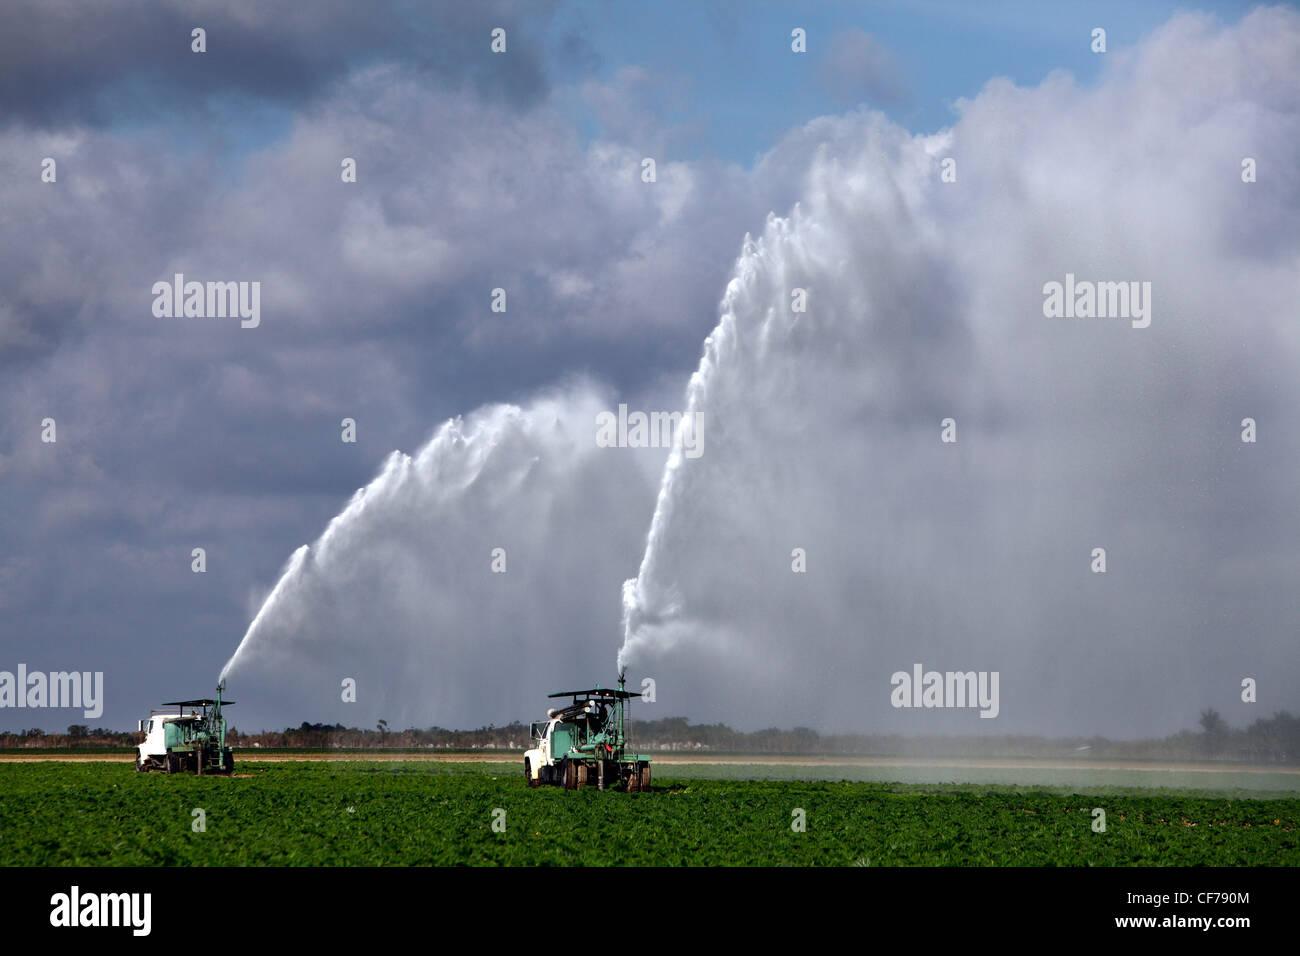 Field irrigation, Homestead, Florida - Stock Image